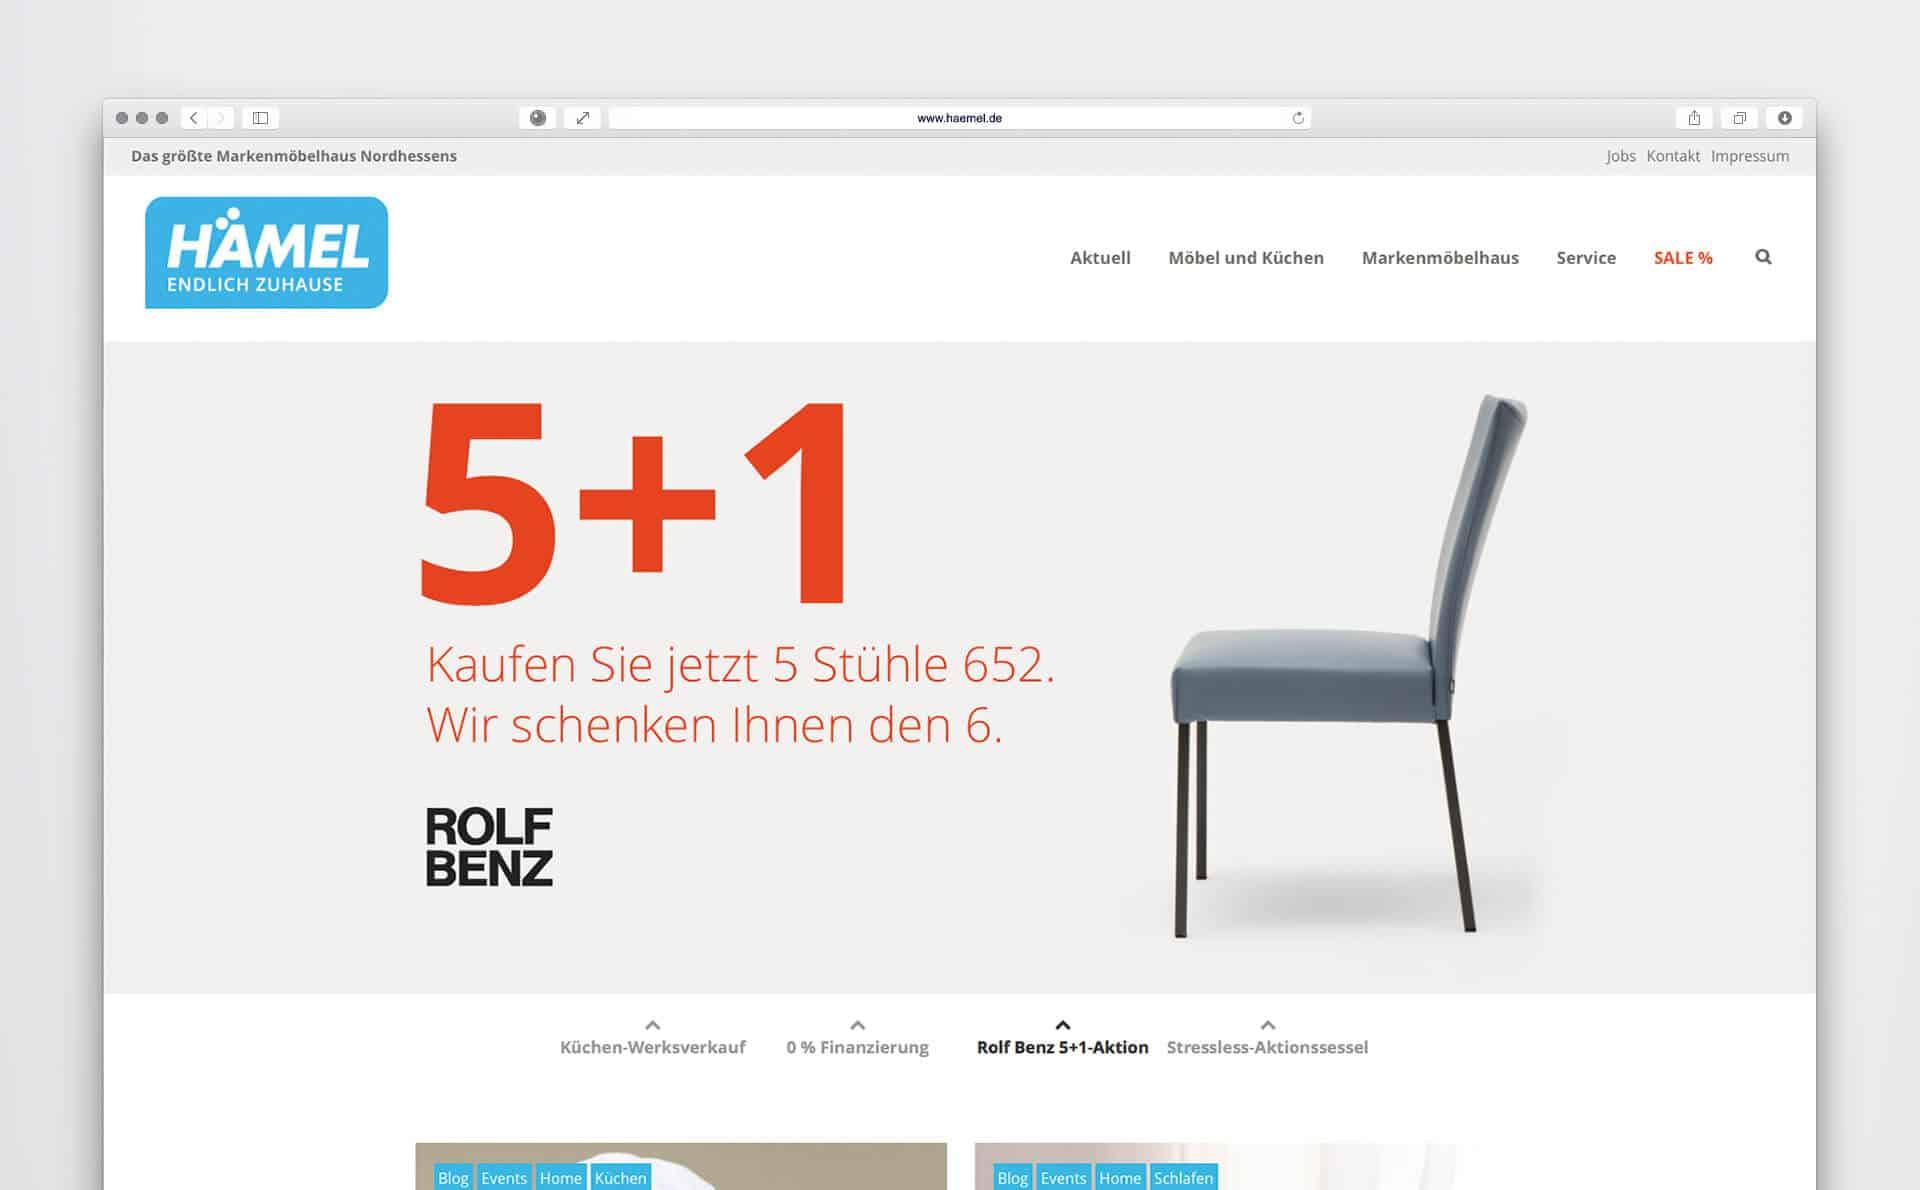 Gerryland-Referenz-Hämel-Website-Screens-1 online-marketing-referenz